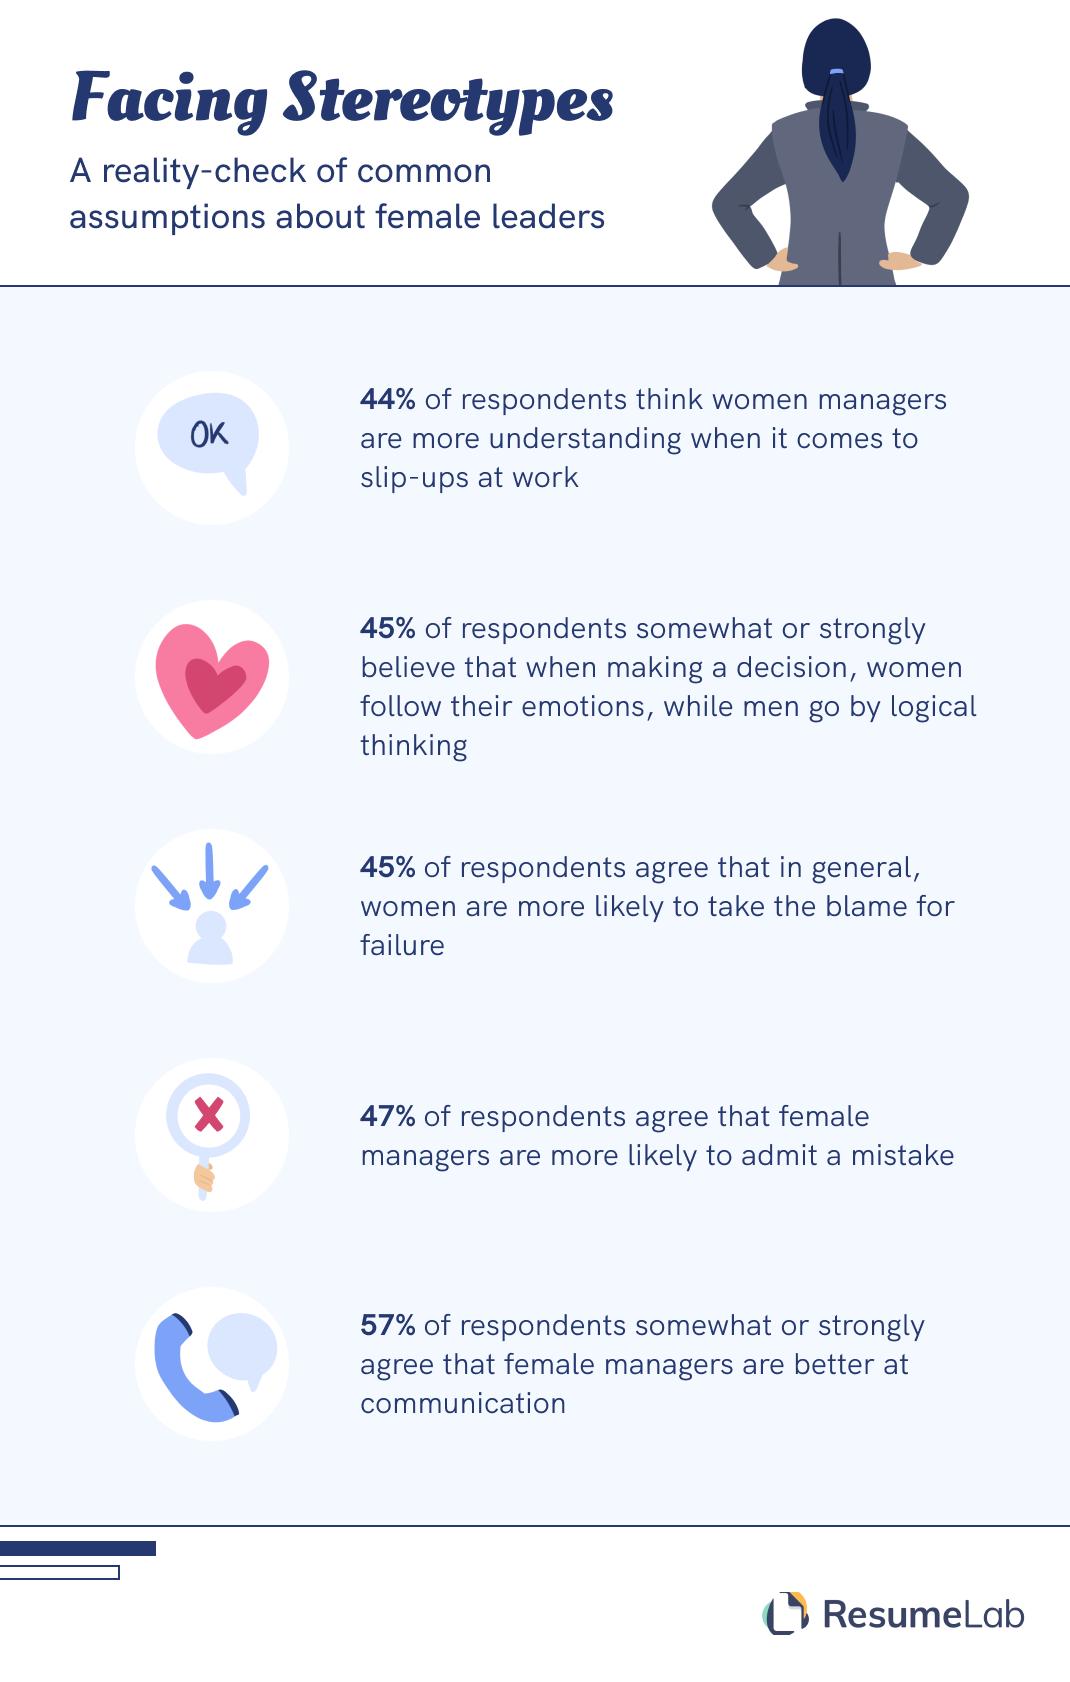 Female leaders facing stereotypes